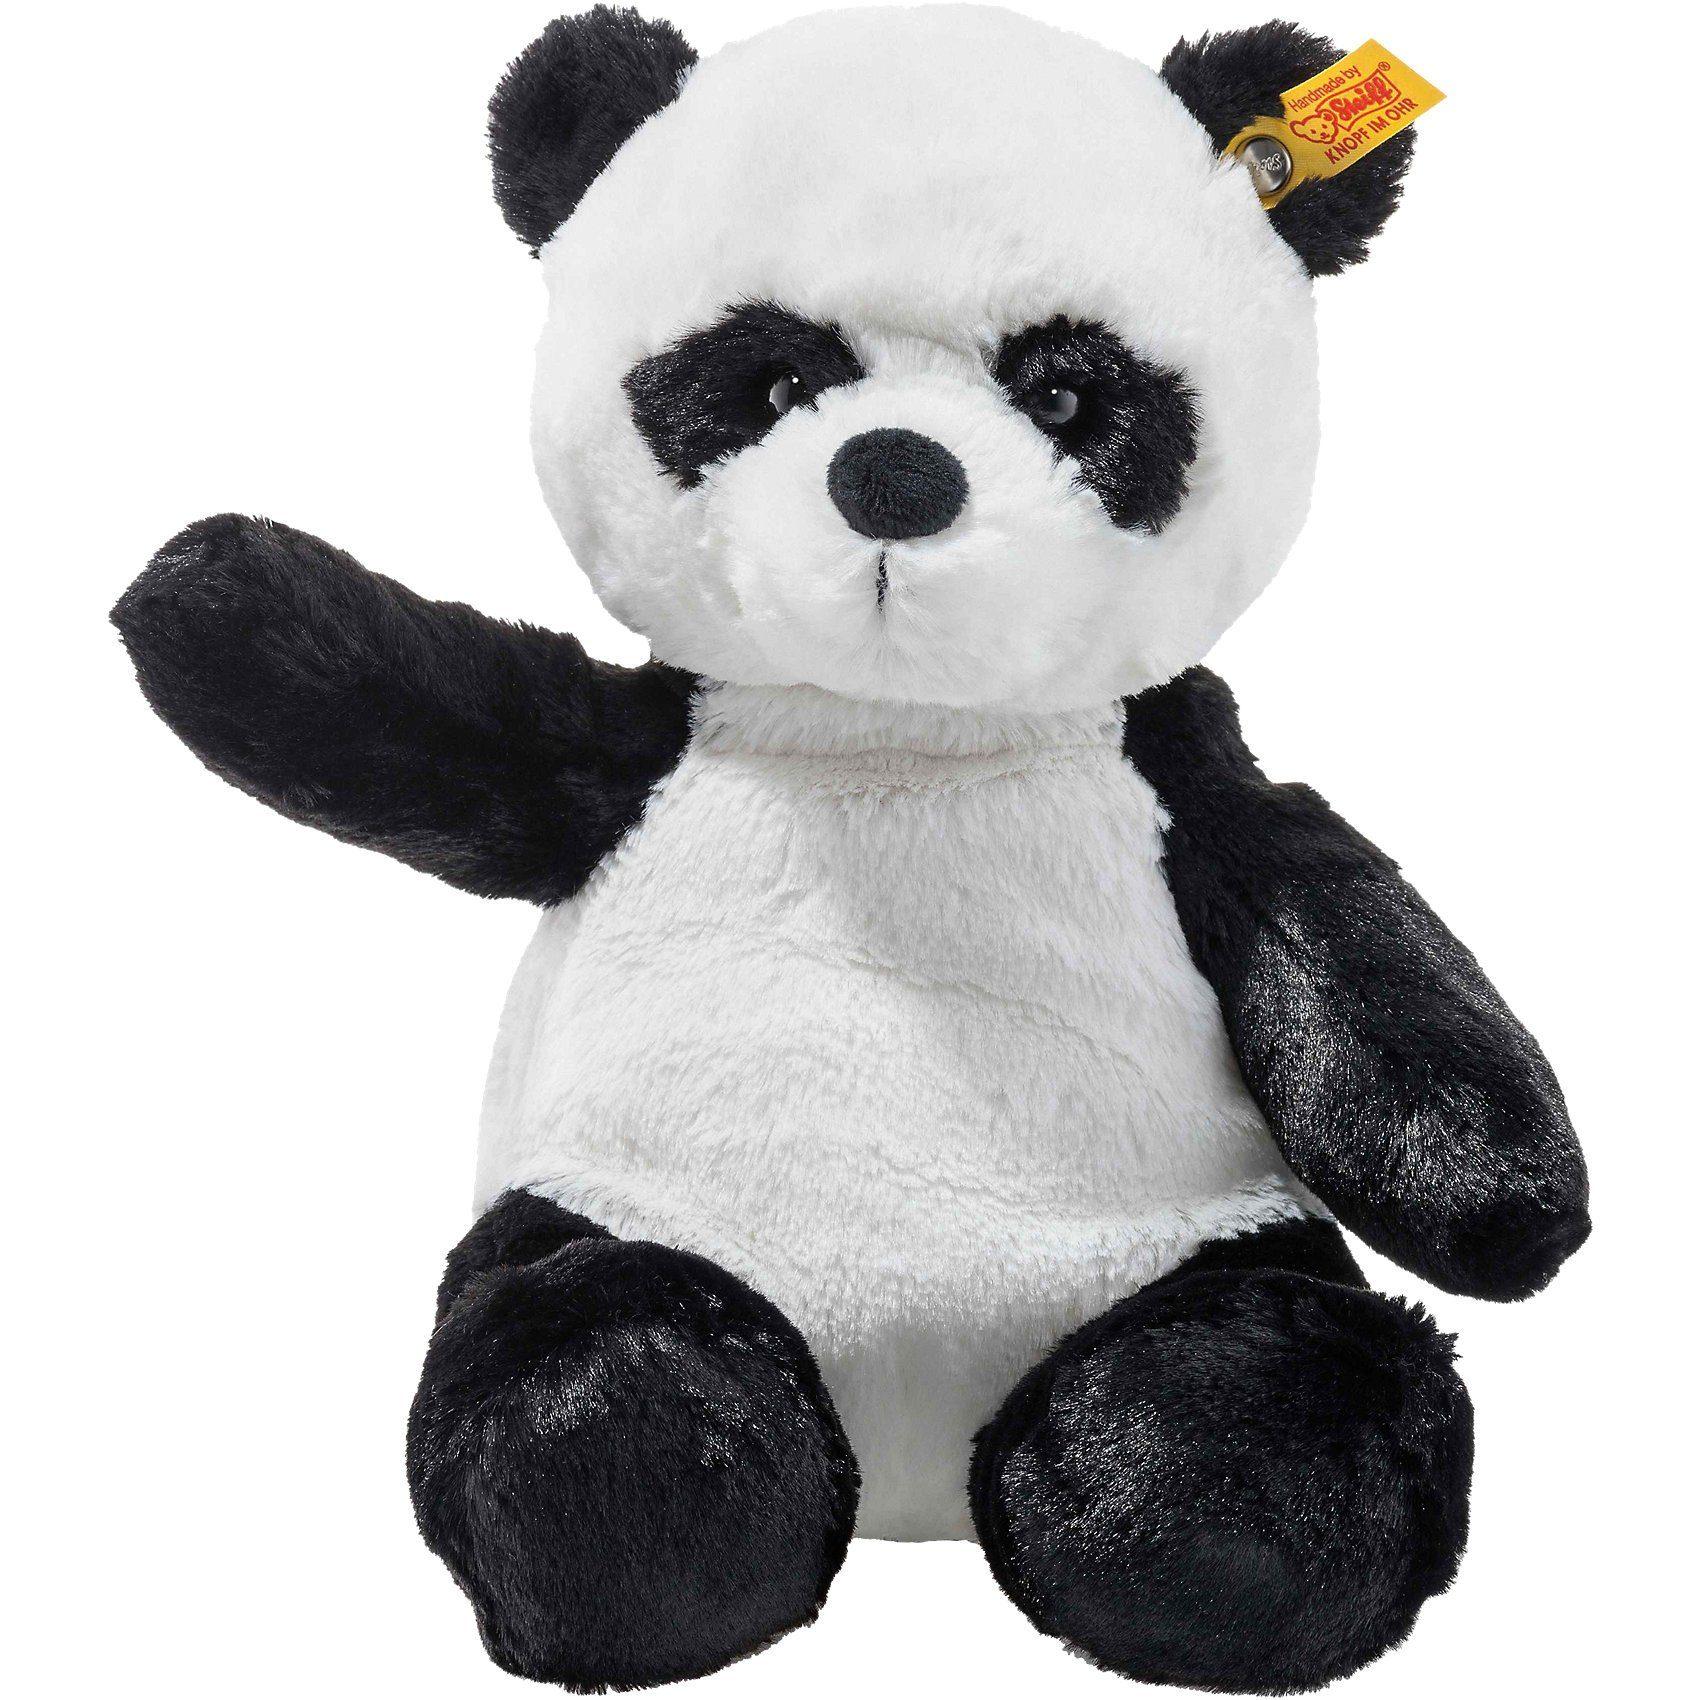 Steiff Soft Cuddly Friends Panda Ming weiss/schwarz, 28 cm